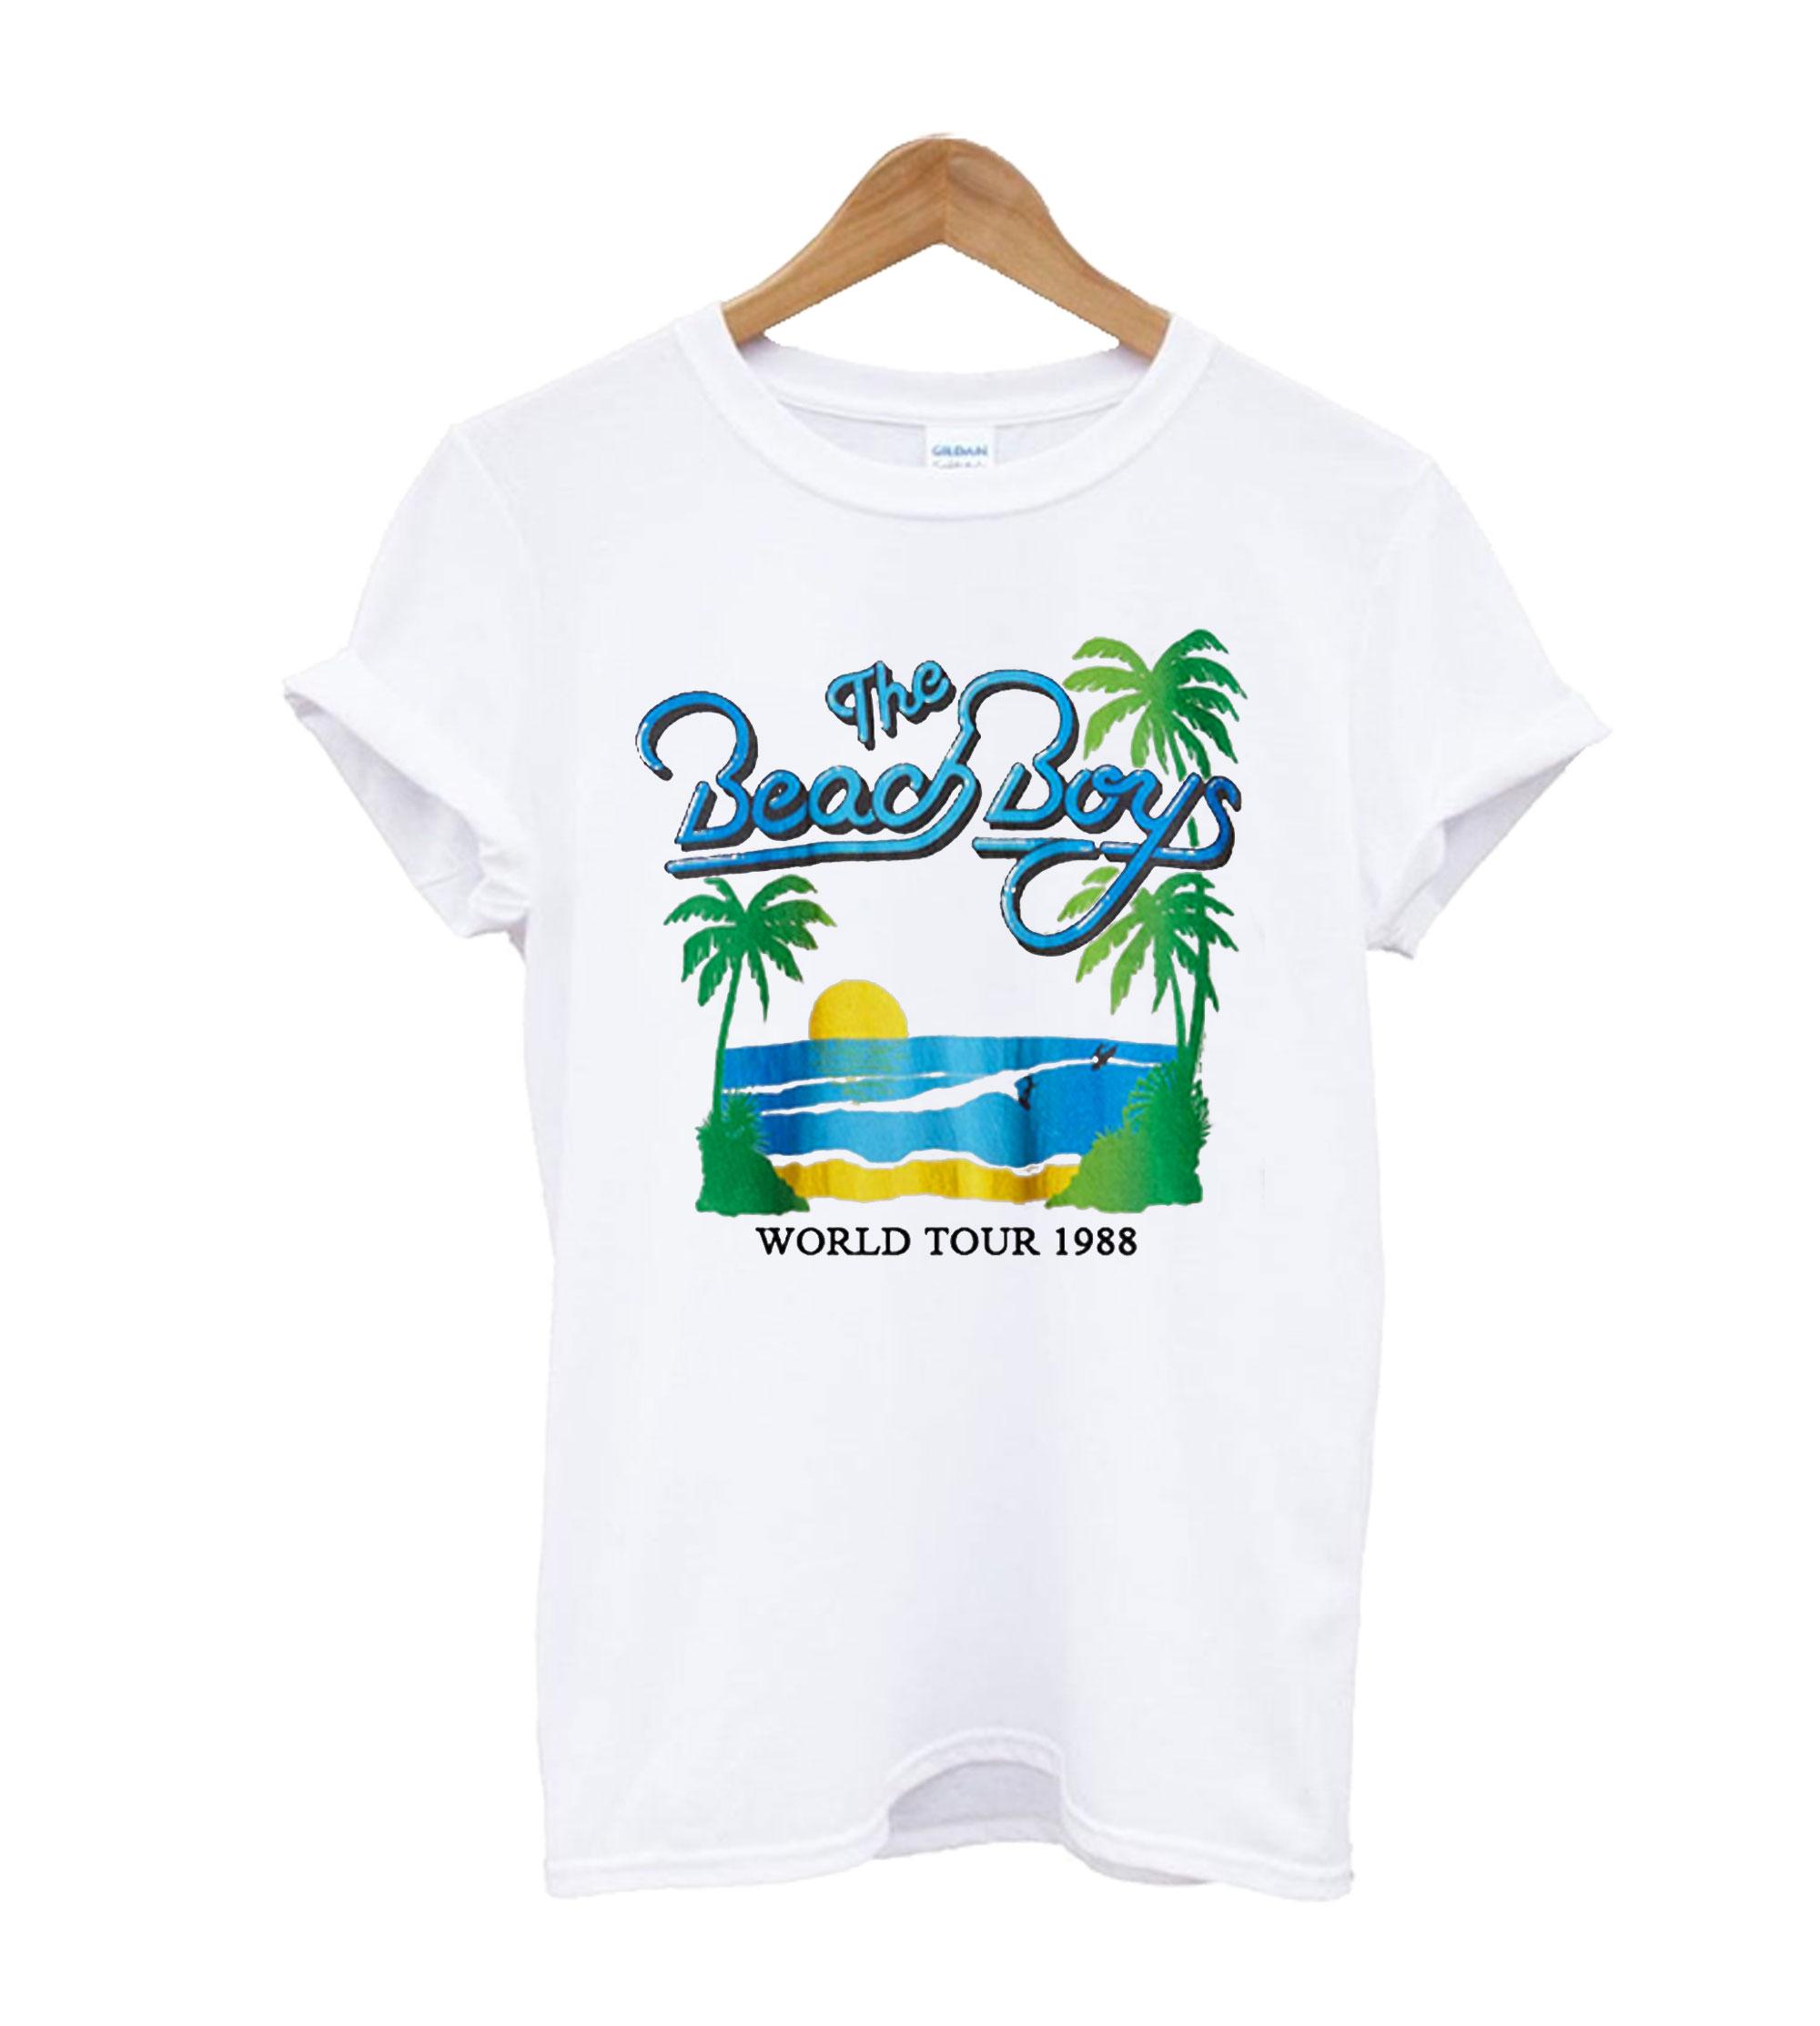 Vintage Beach Boys T shirt